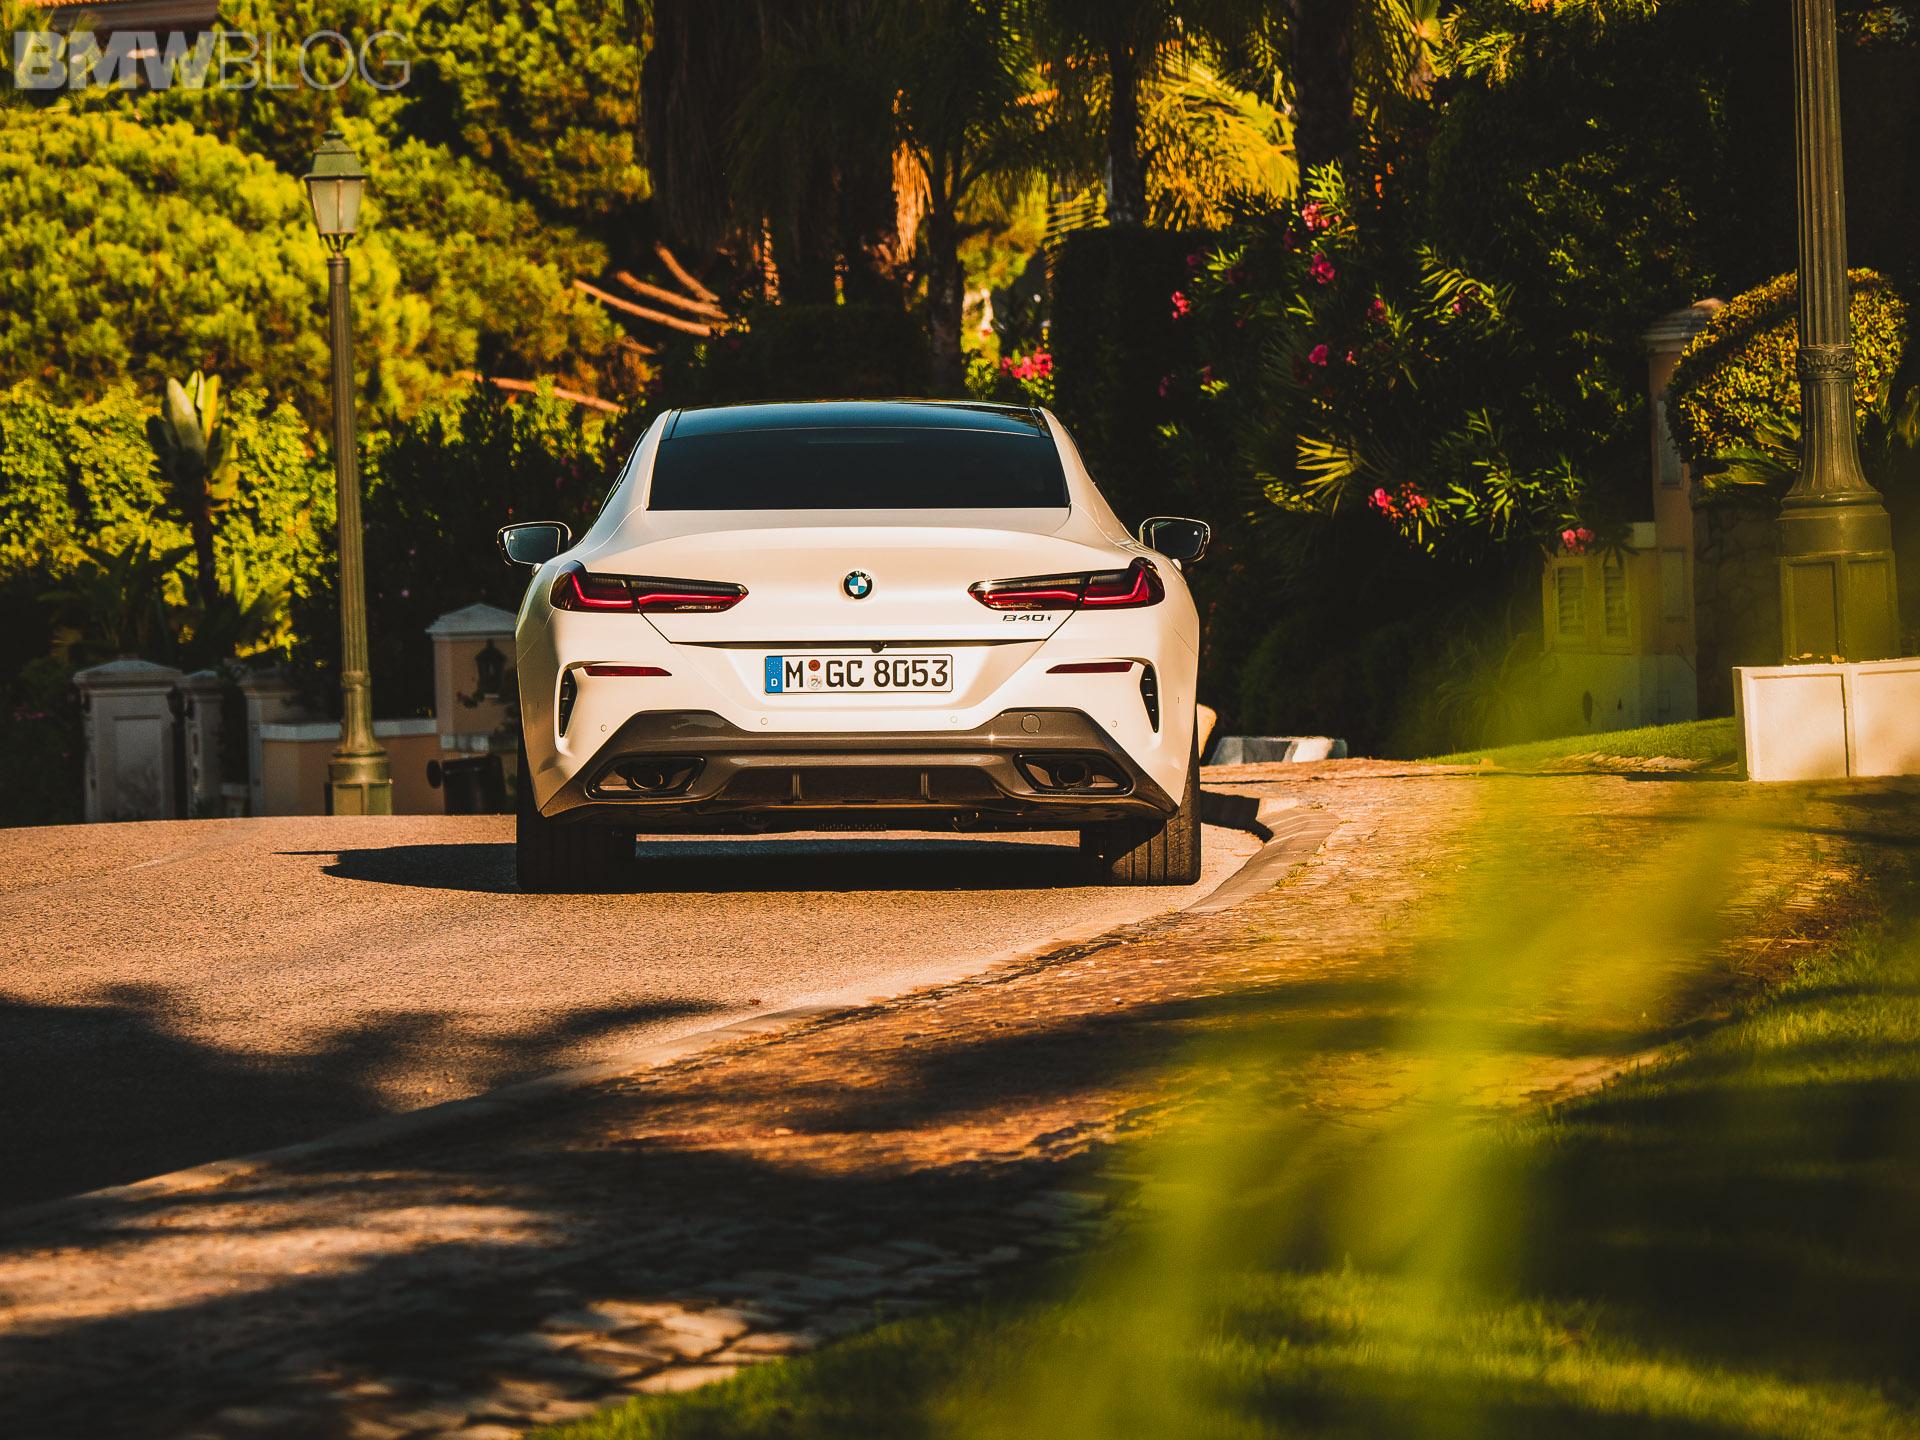 2020 BMW 8 SERIES GRAN COUPE PHOTOS 15